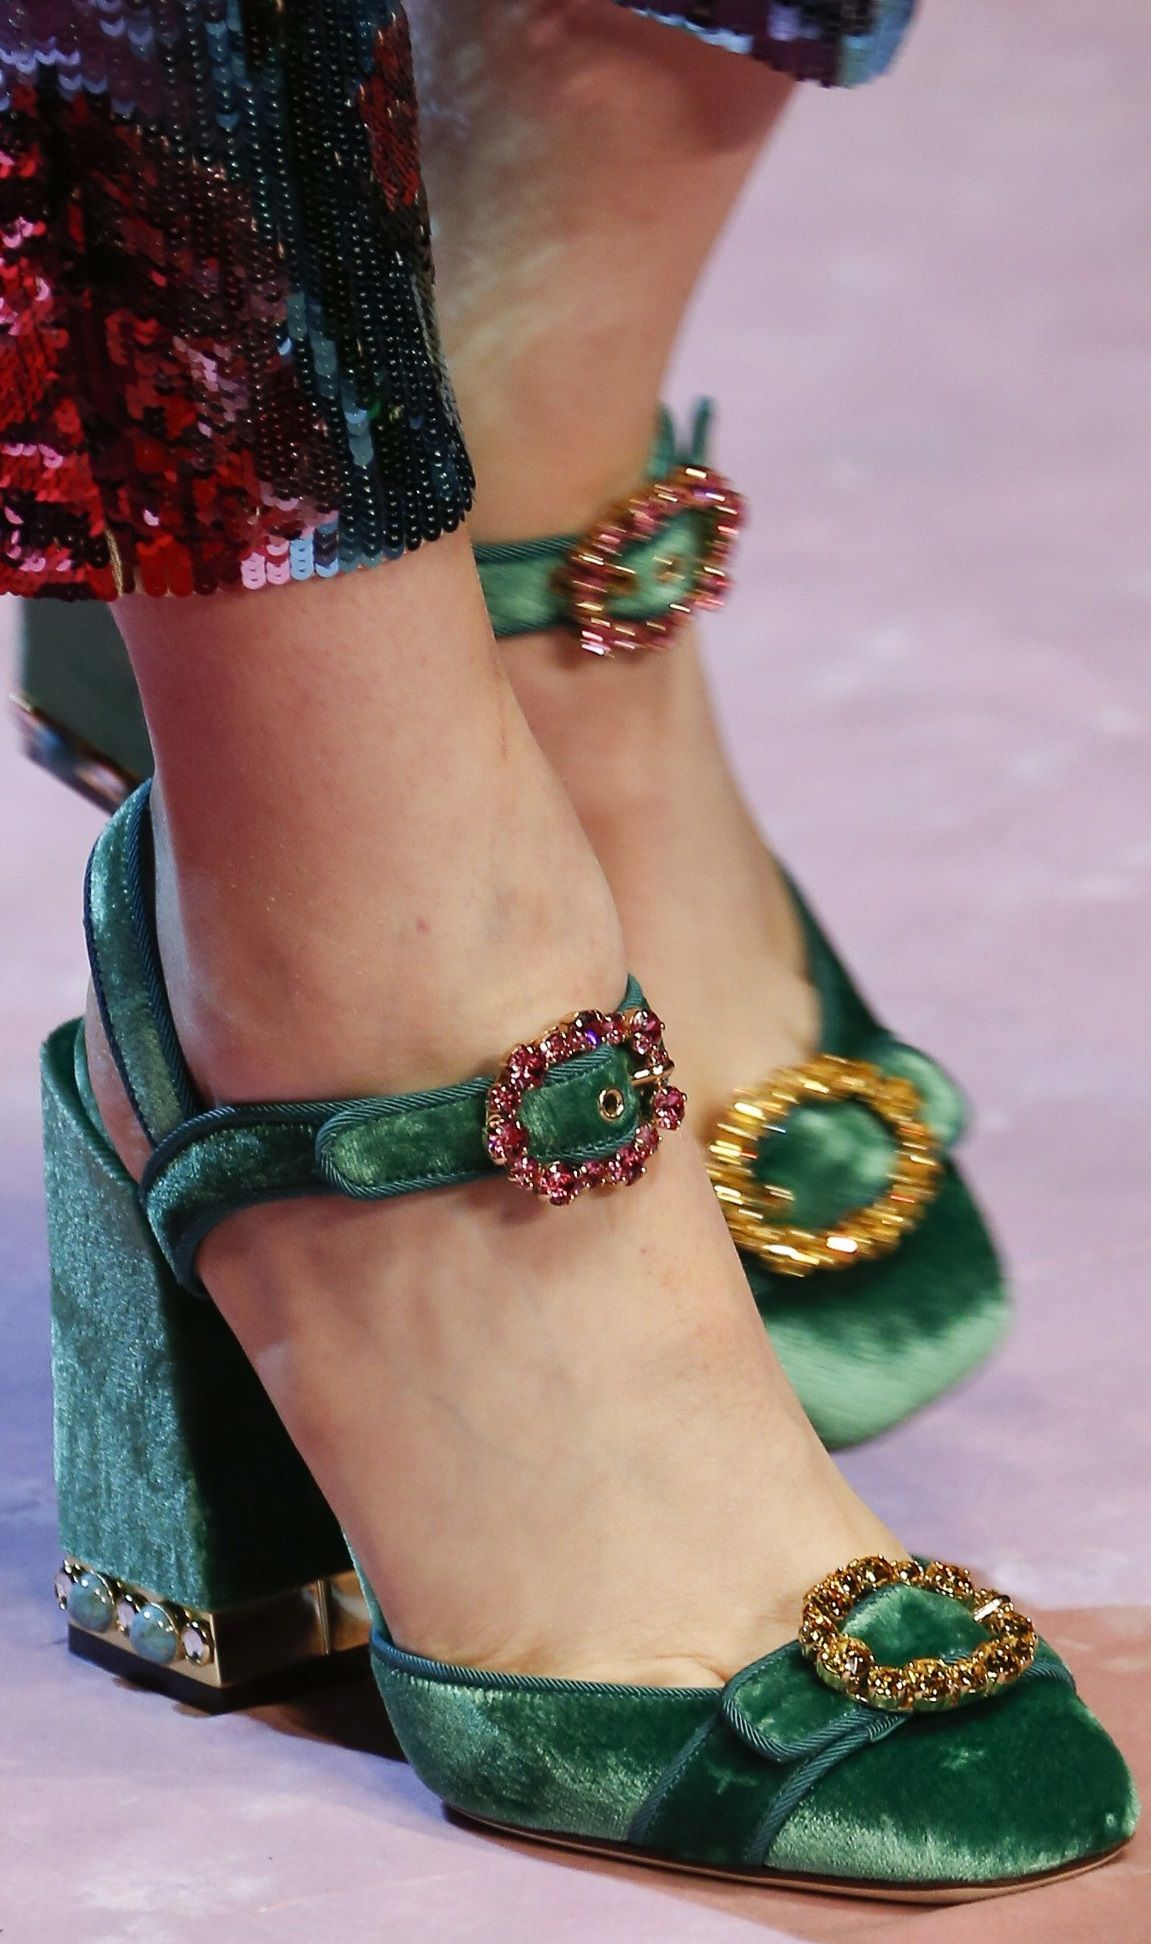 Polka Dots Printed KEIRA Wedges Spring/summerDolce & Gabbana KjqS21yYt